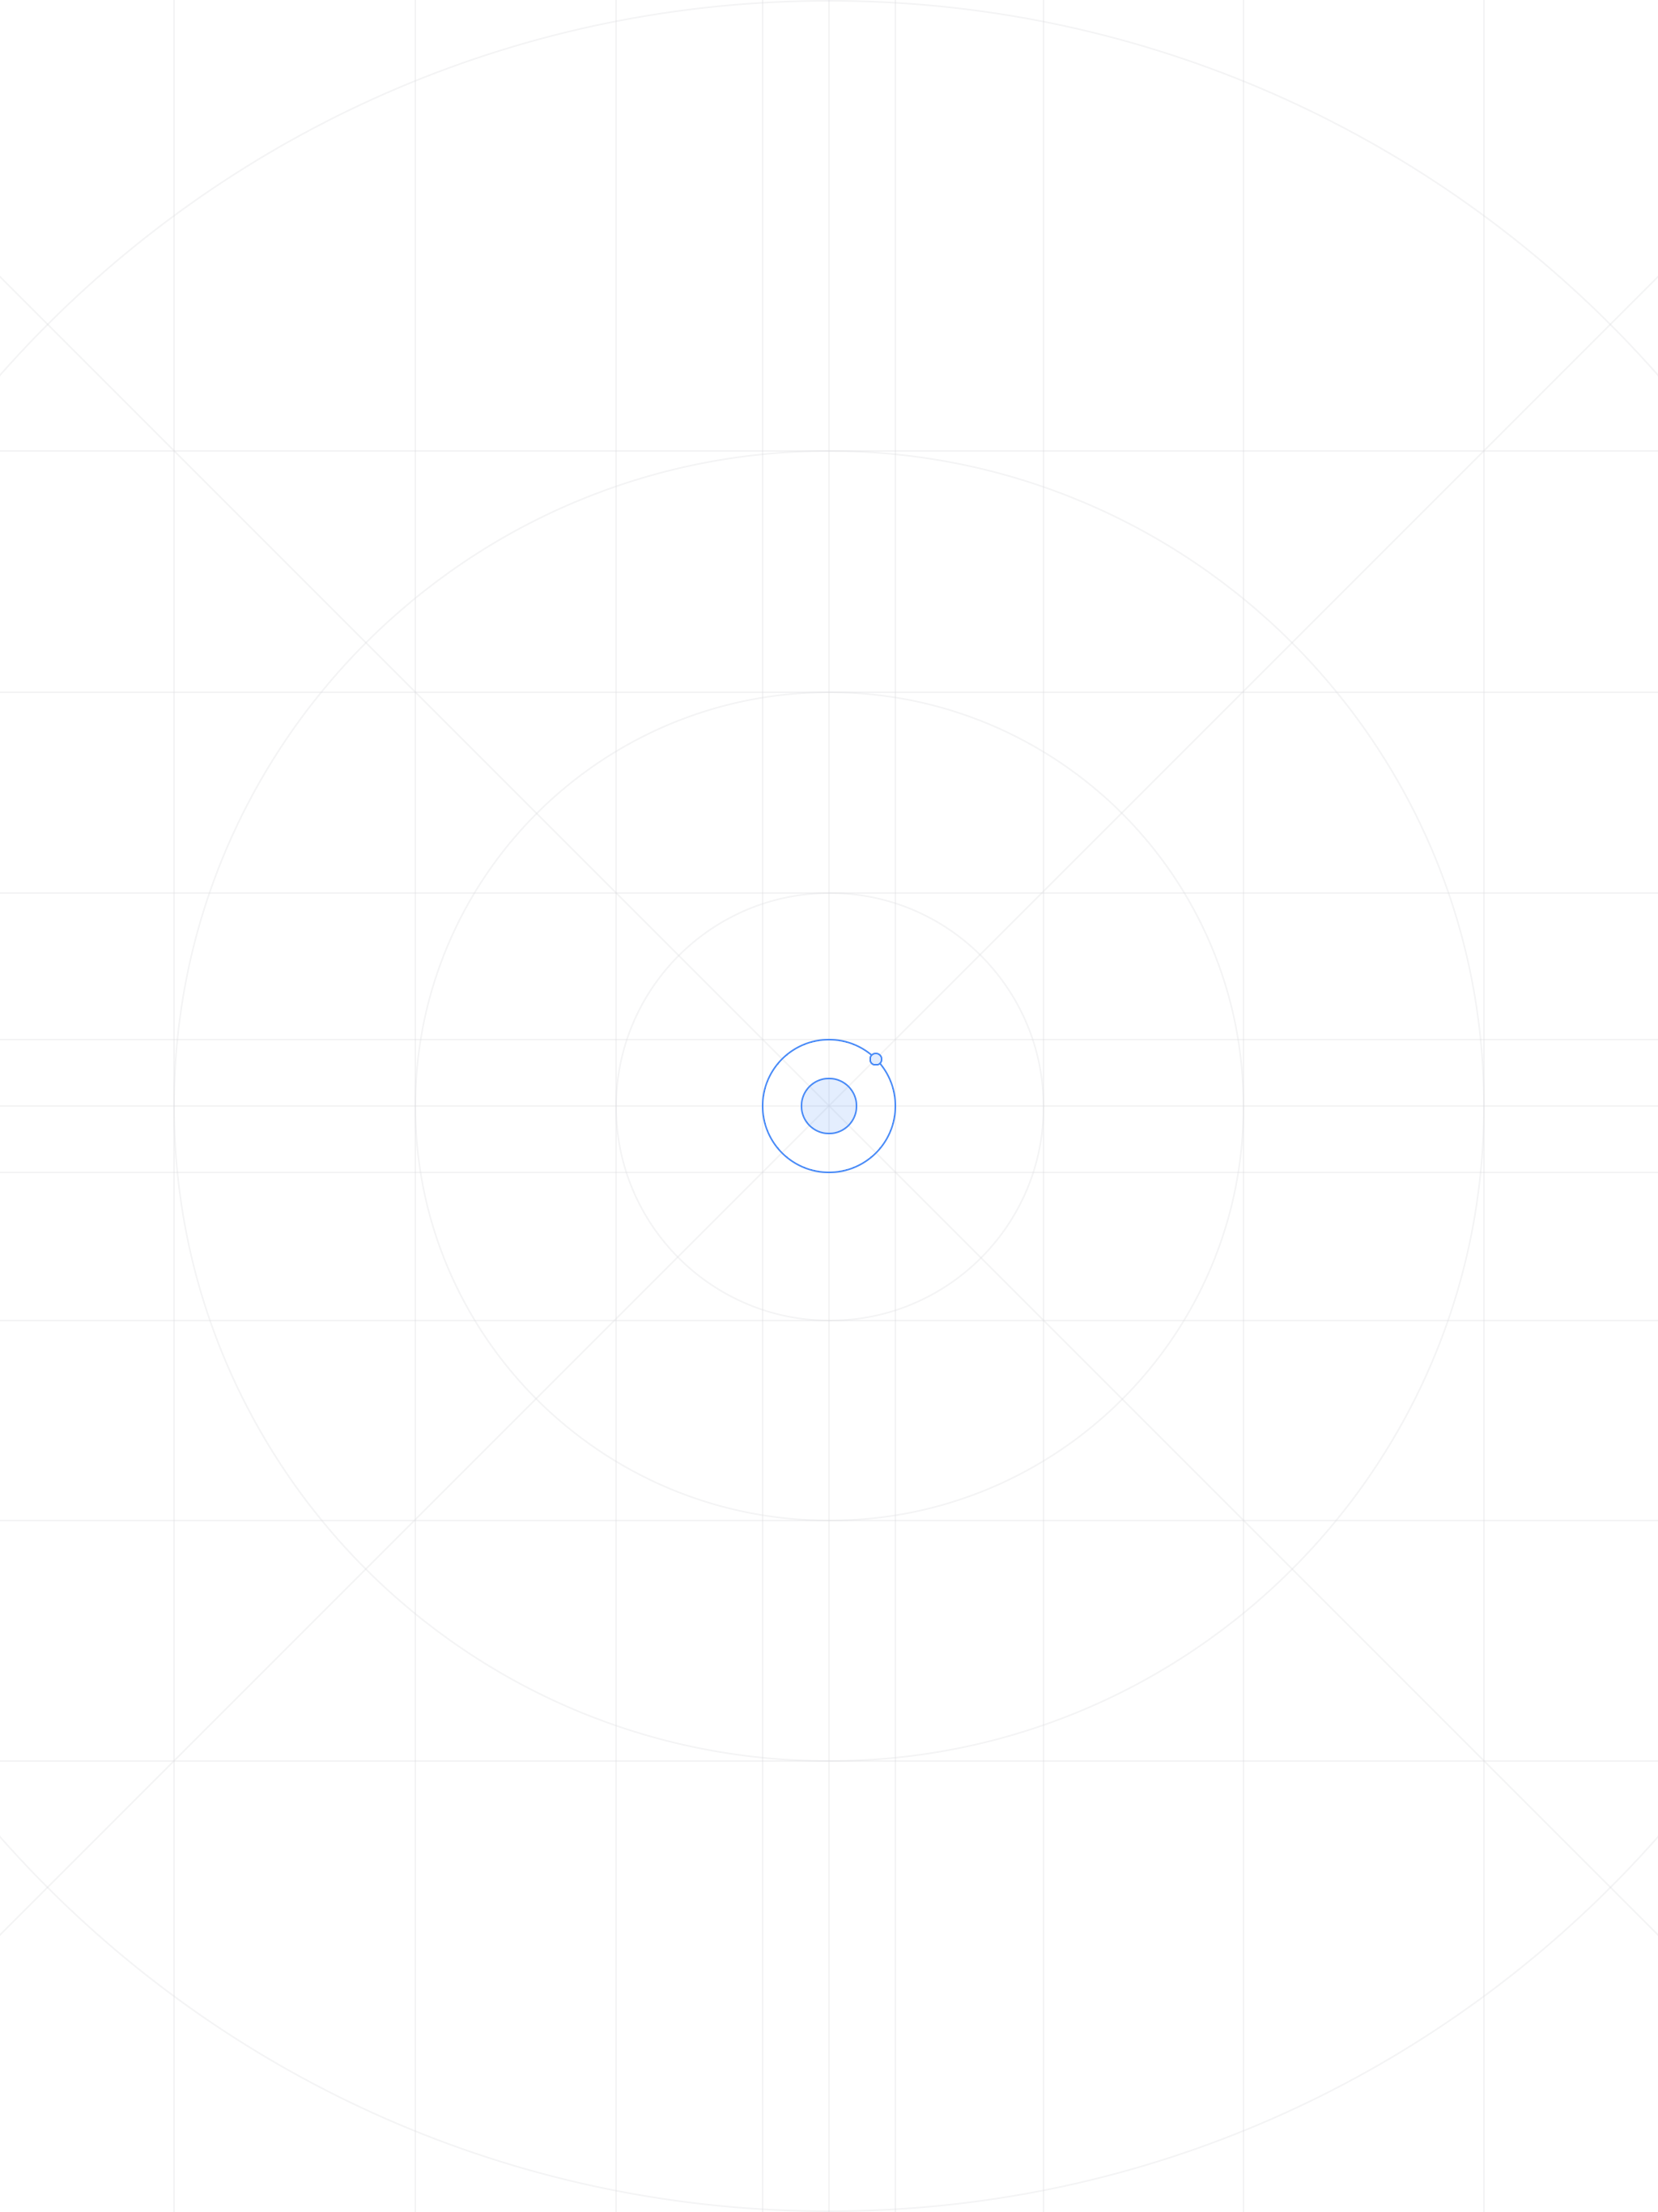 klu5/resources/ios/splash/Default-Portrait@~ipadpro.png